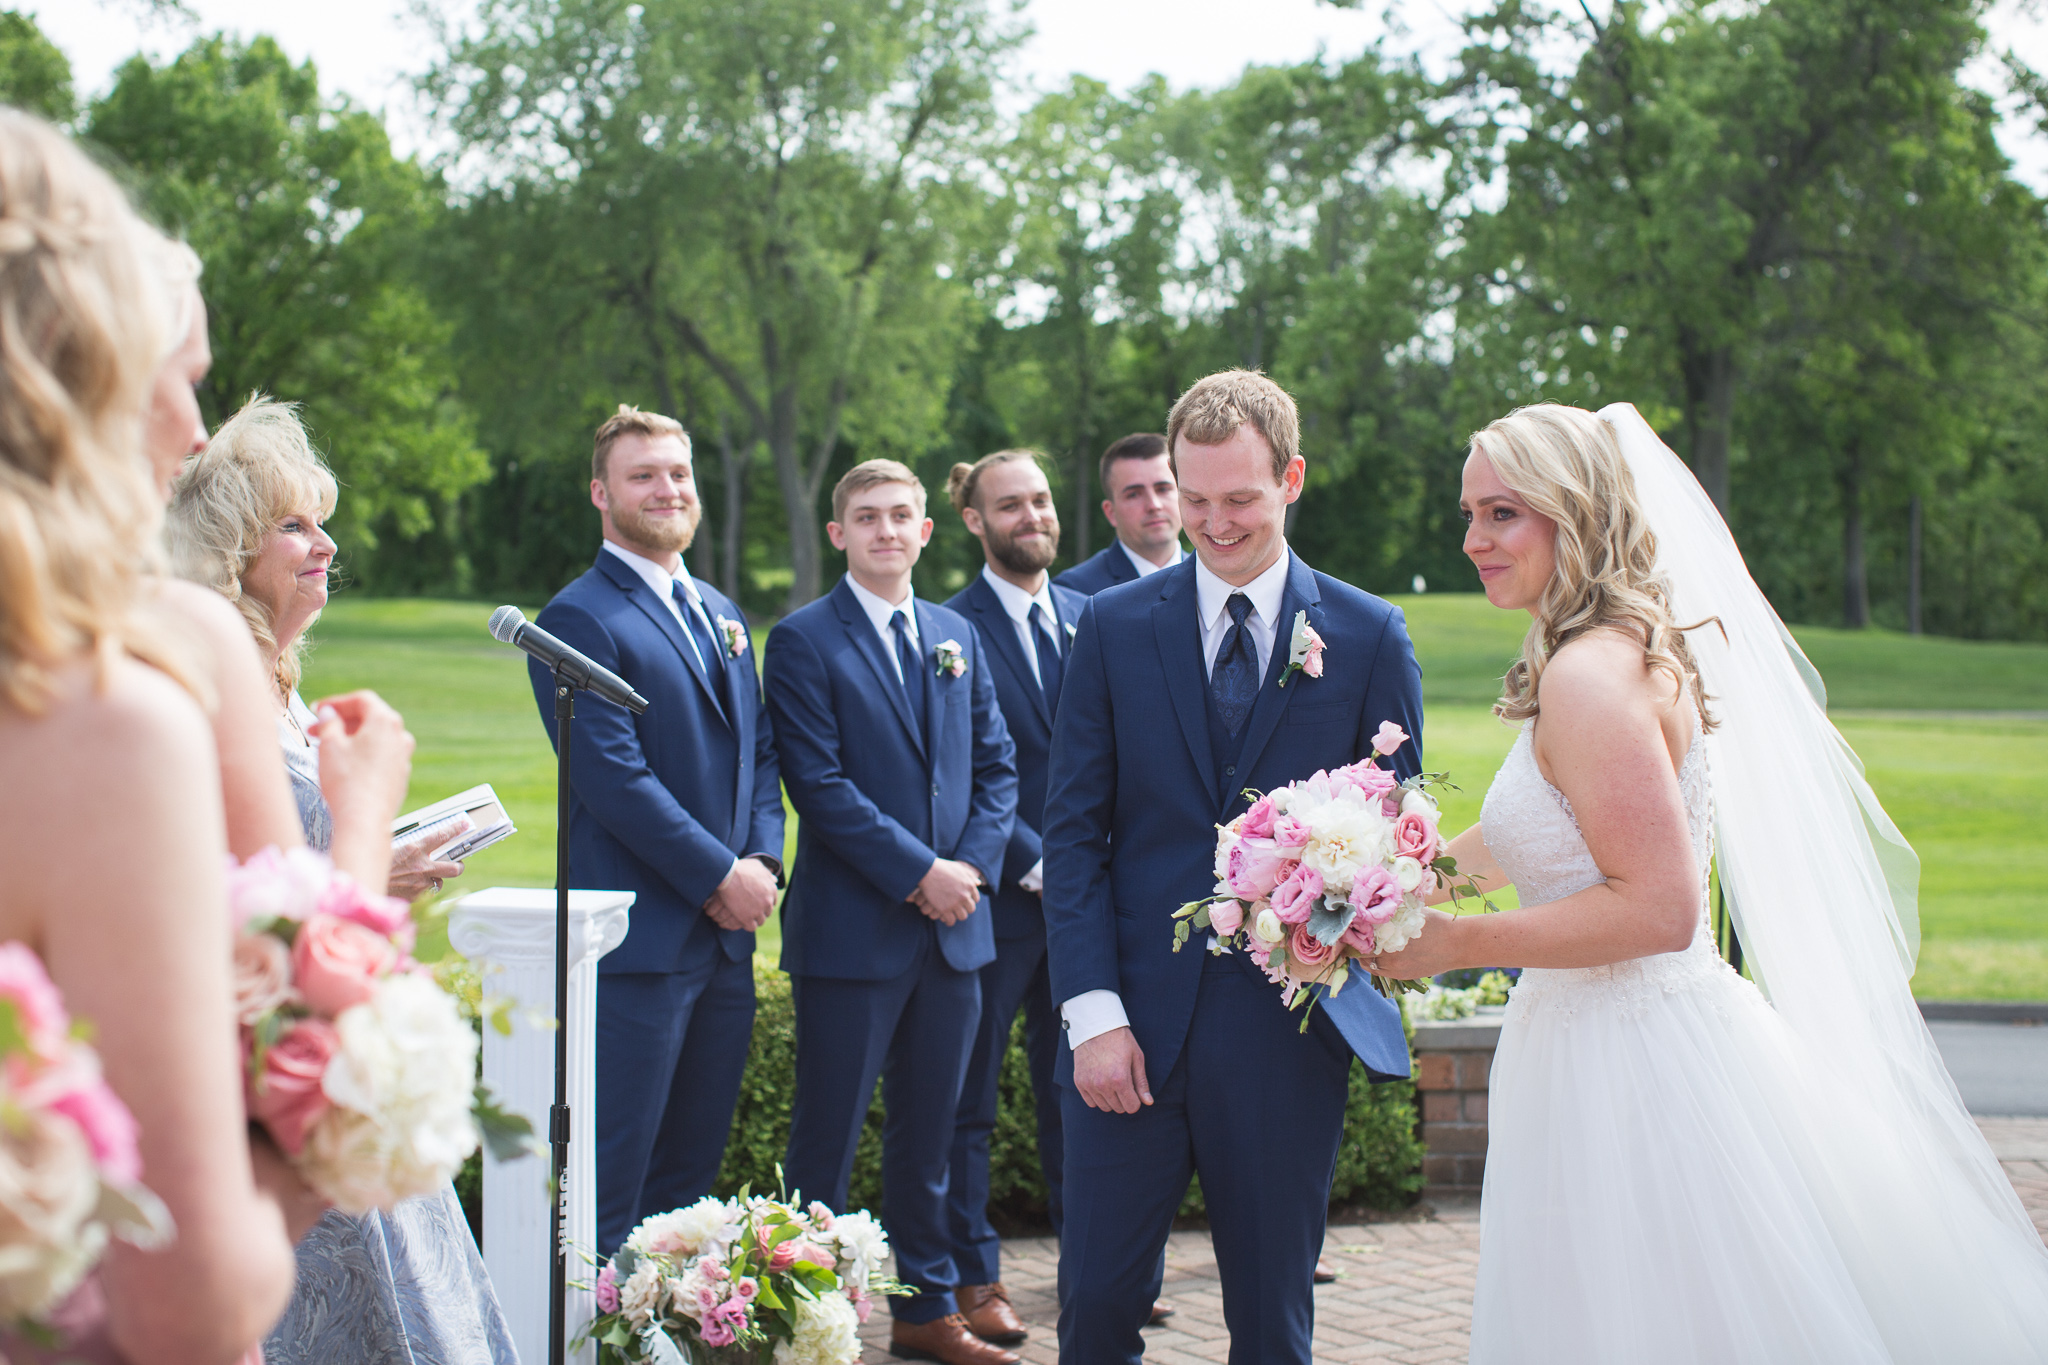 077-best-detroit-michigan-outdoor-wedding-photographer.jpg